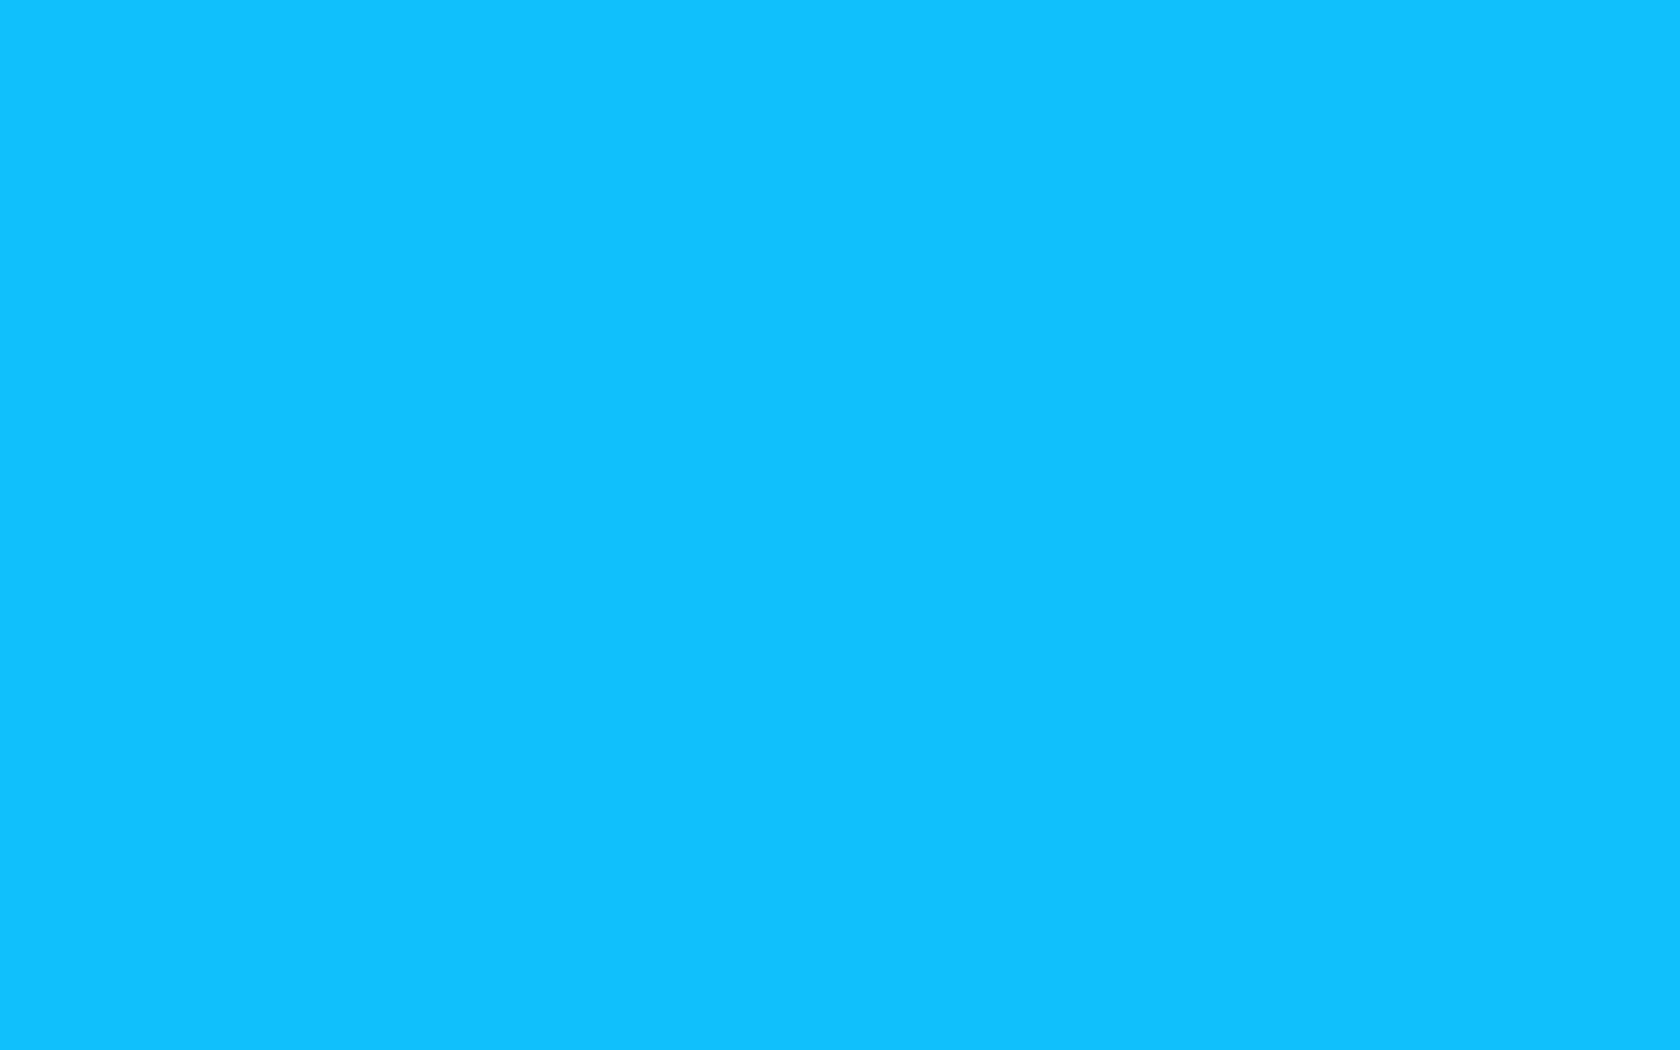 1680x1050 Spiro Disco Ball Solid Color Background